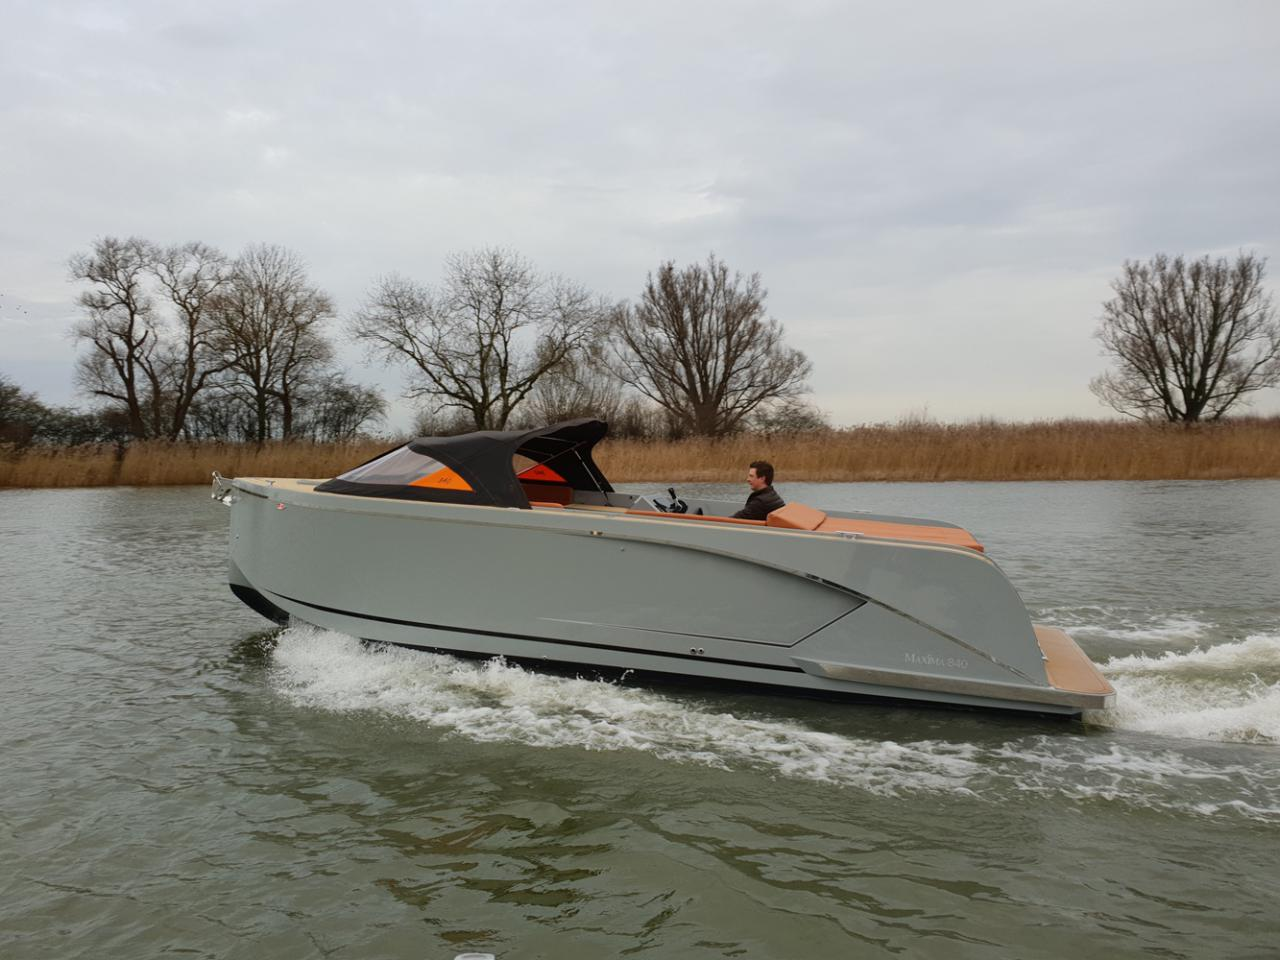 Maxima 840 tender 19